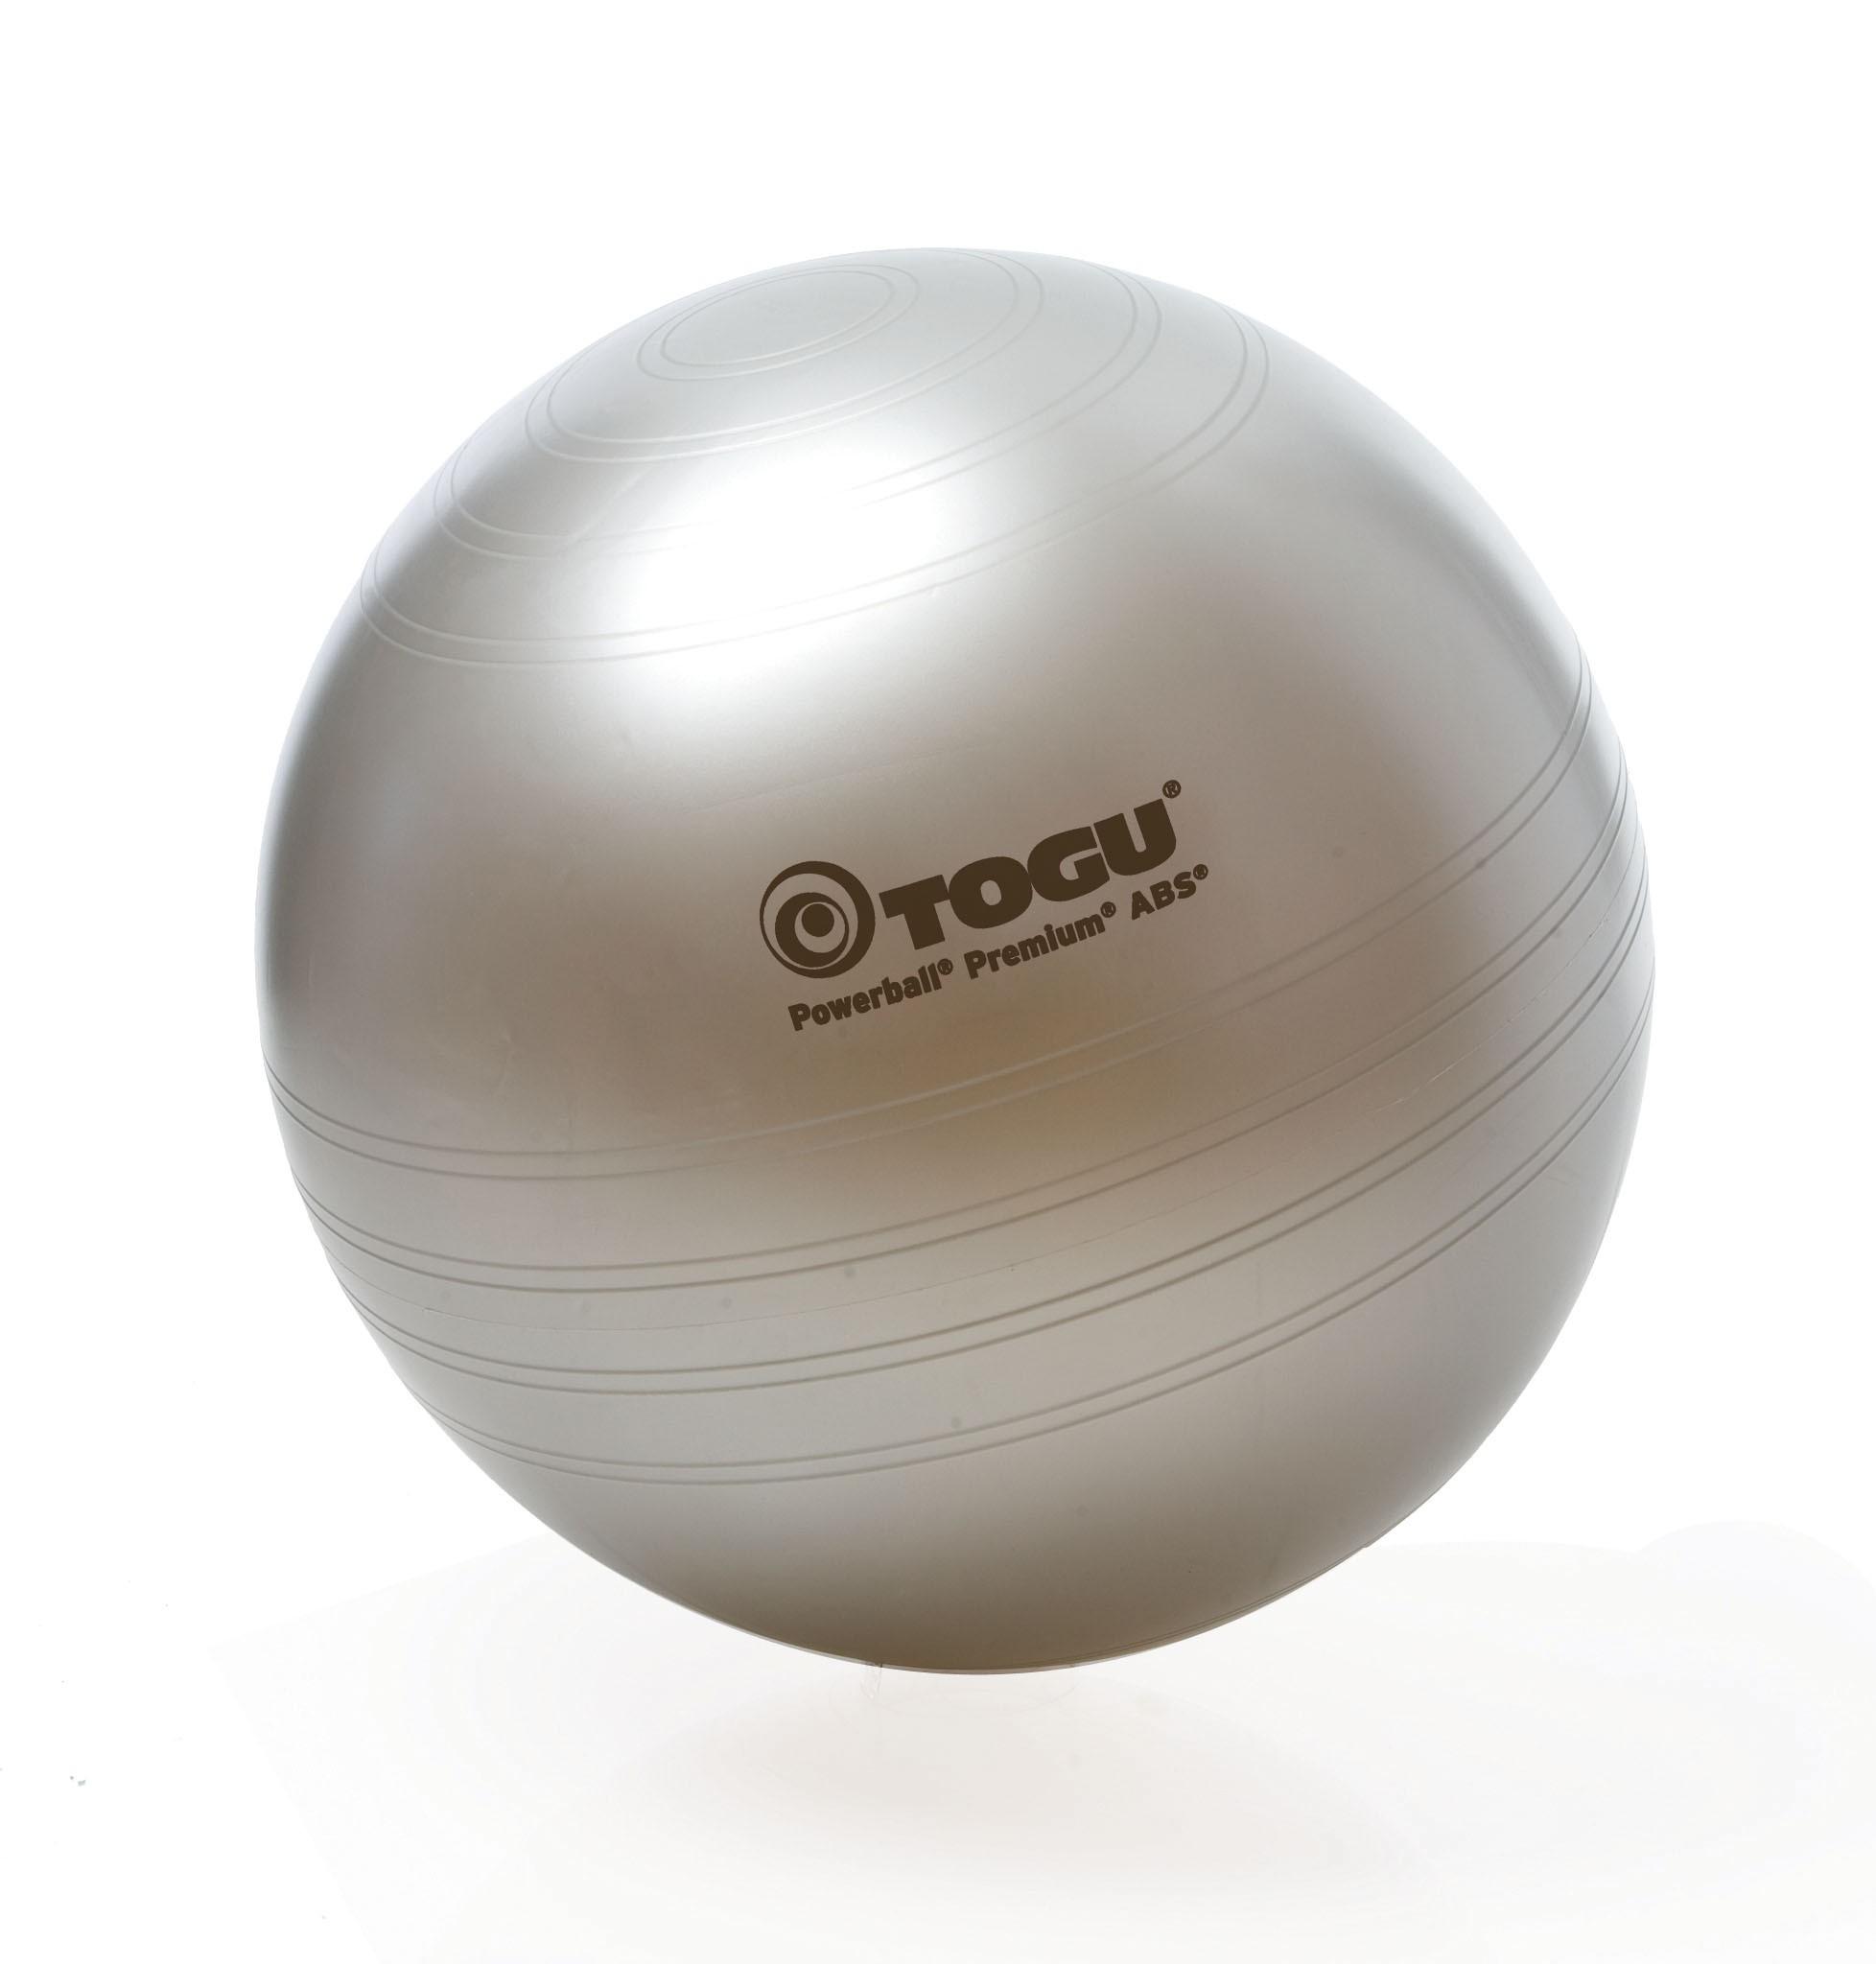 Togu Powerbal Premium ABS zilver